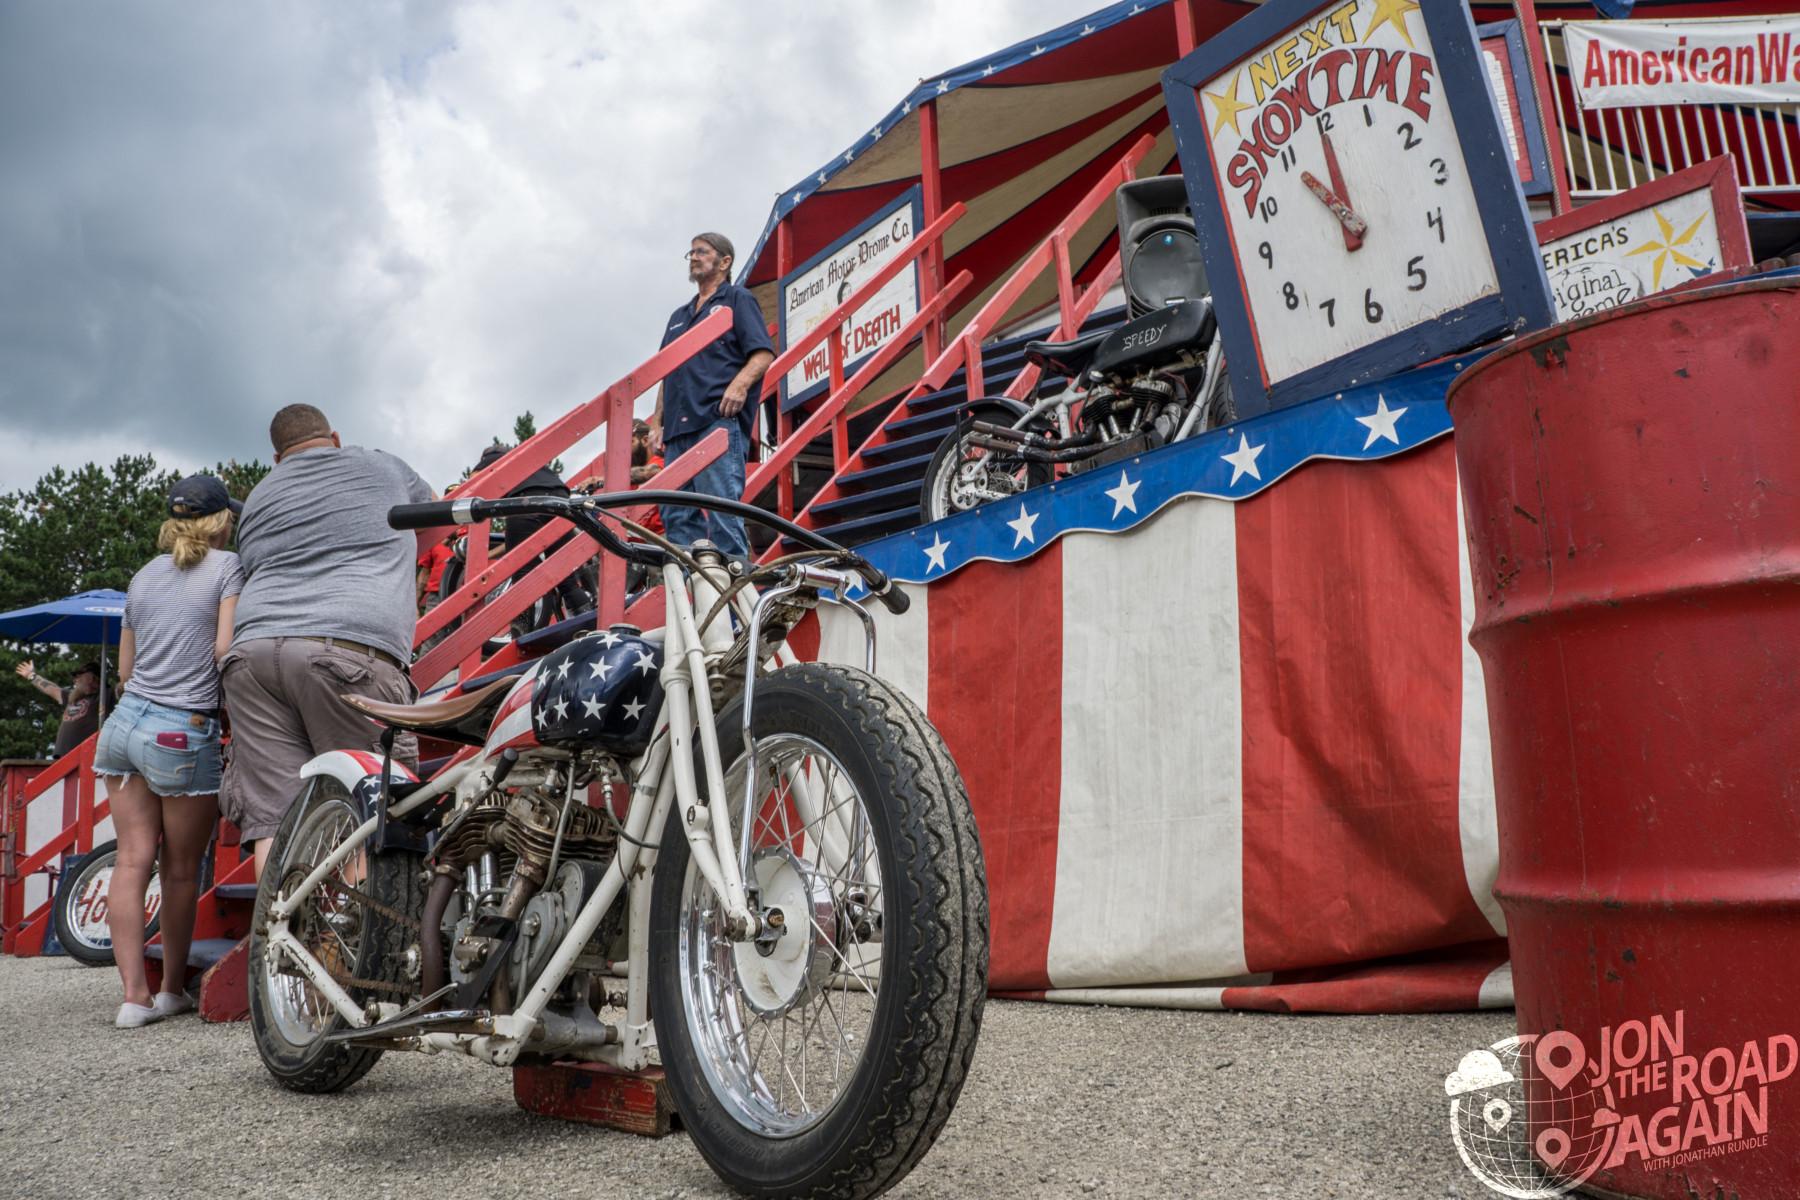 2017 AMA Vintage Days Dates Announced | Rider Magazine